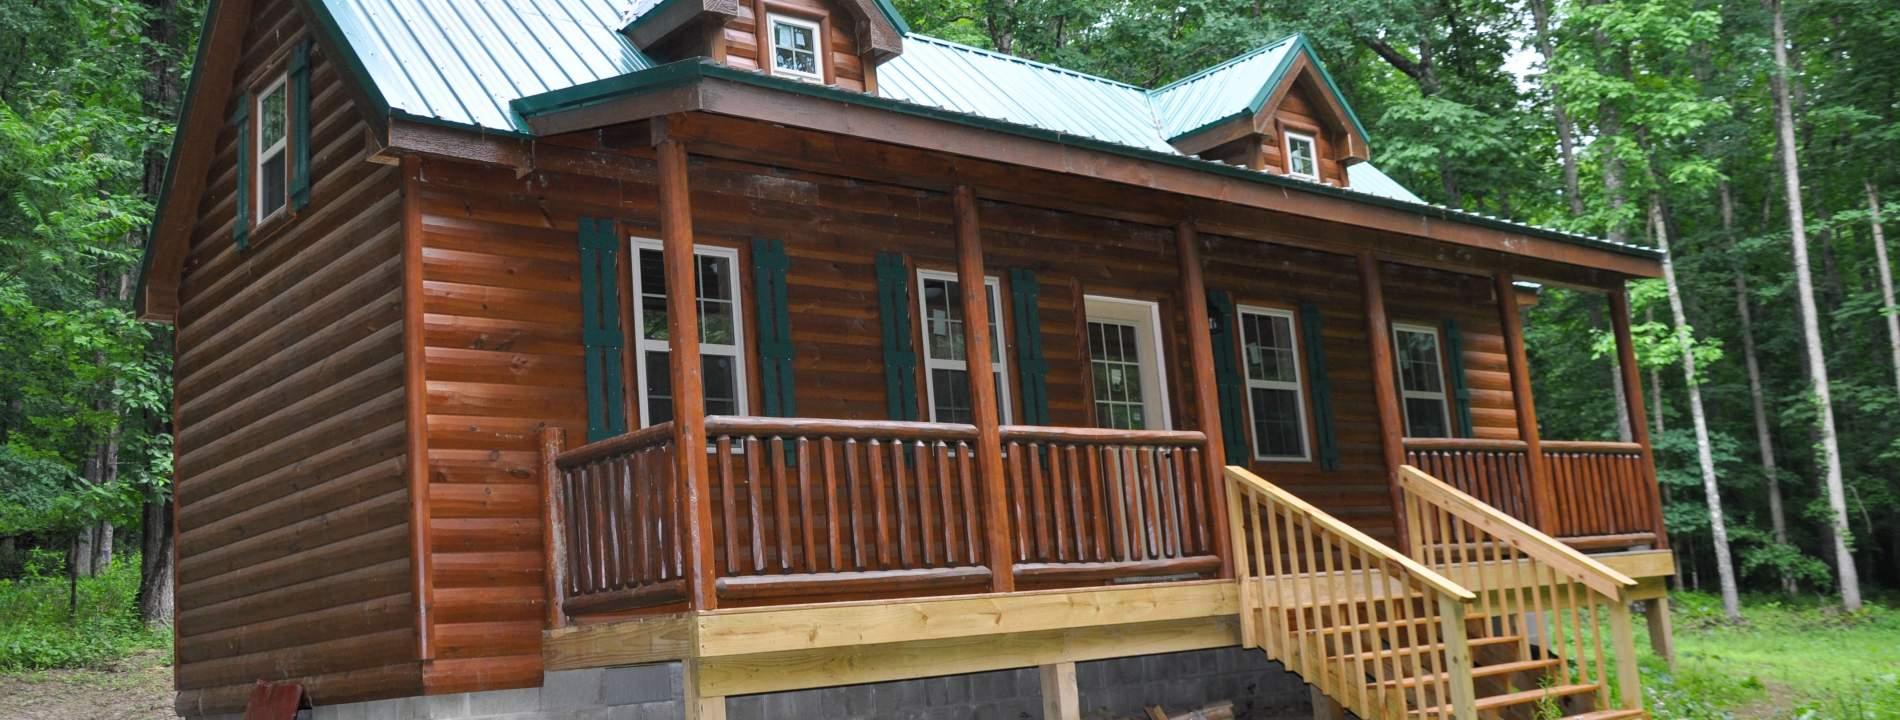 Plymouth Cabin single wide cabins modular home